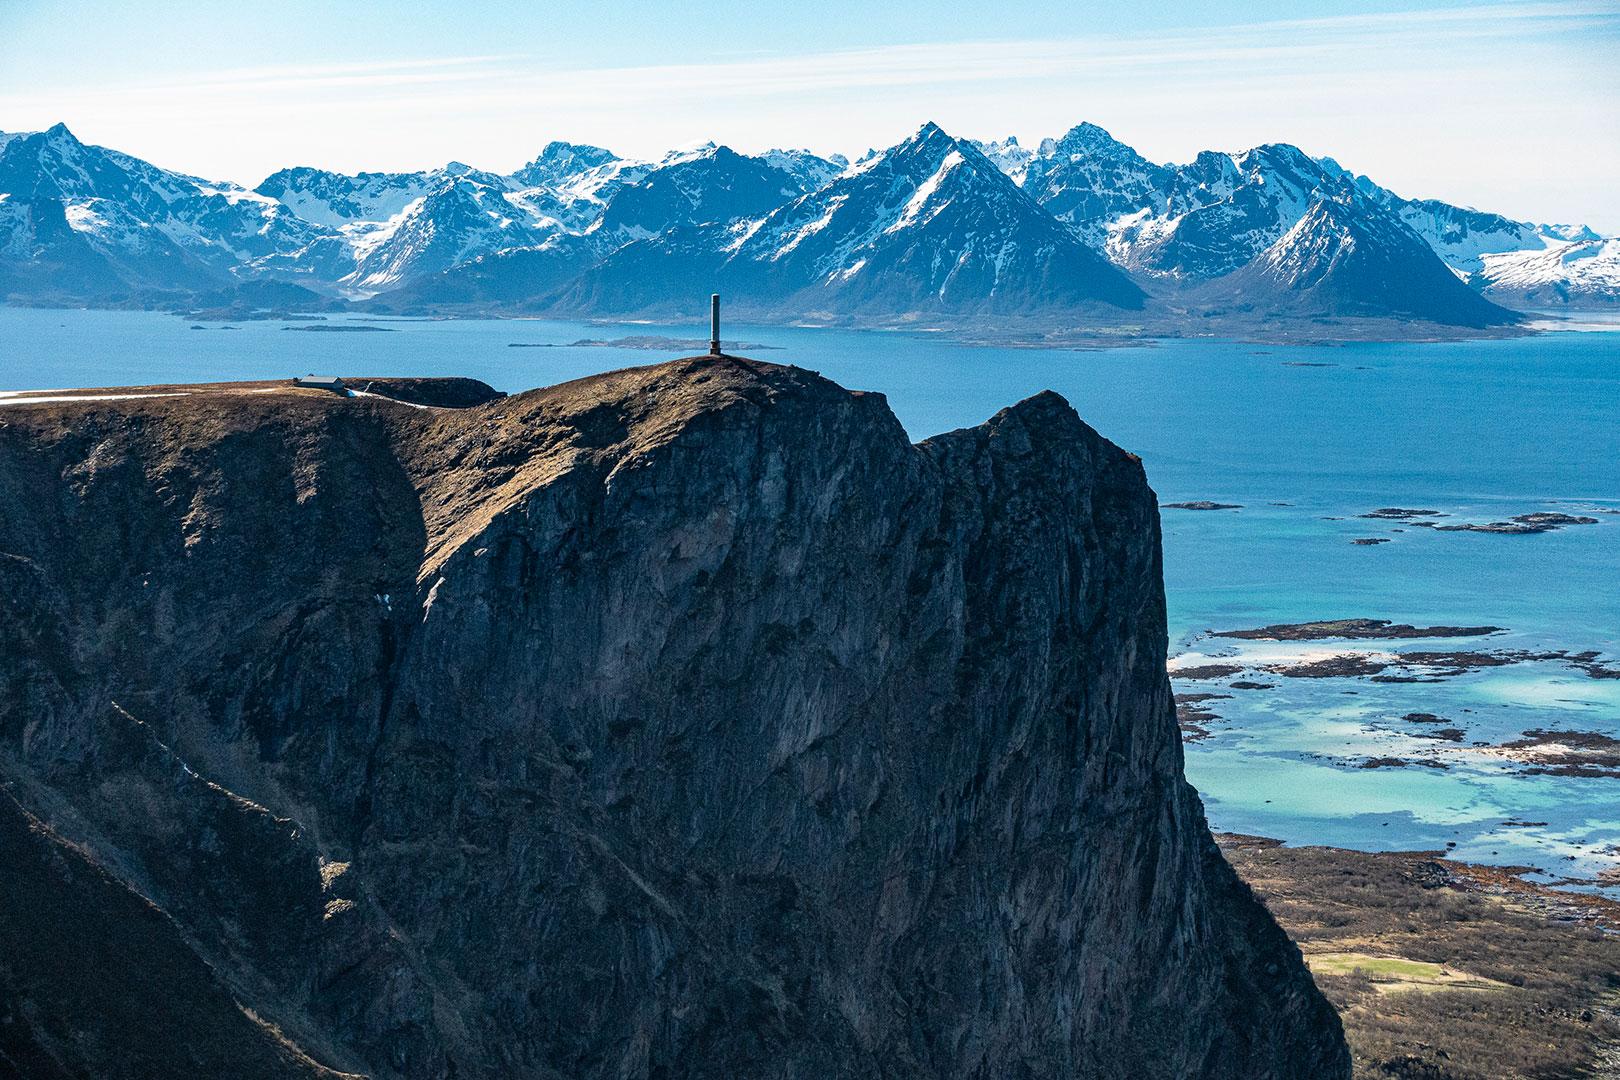 Pallheia på Hadseløya